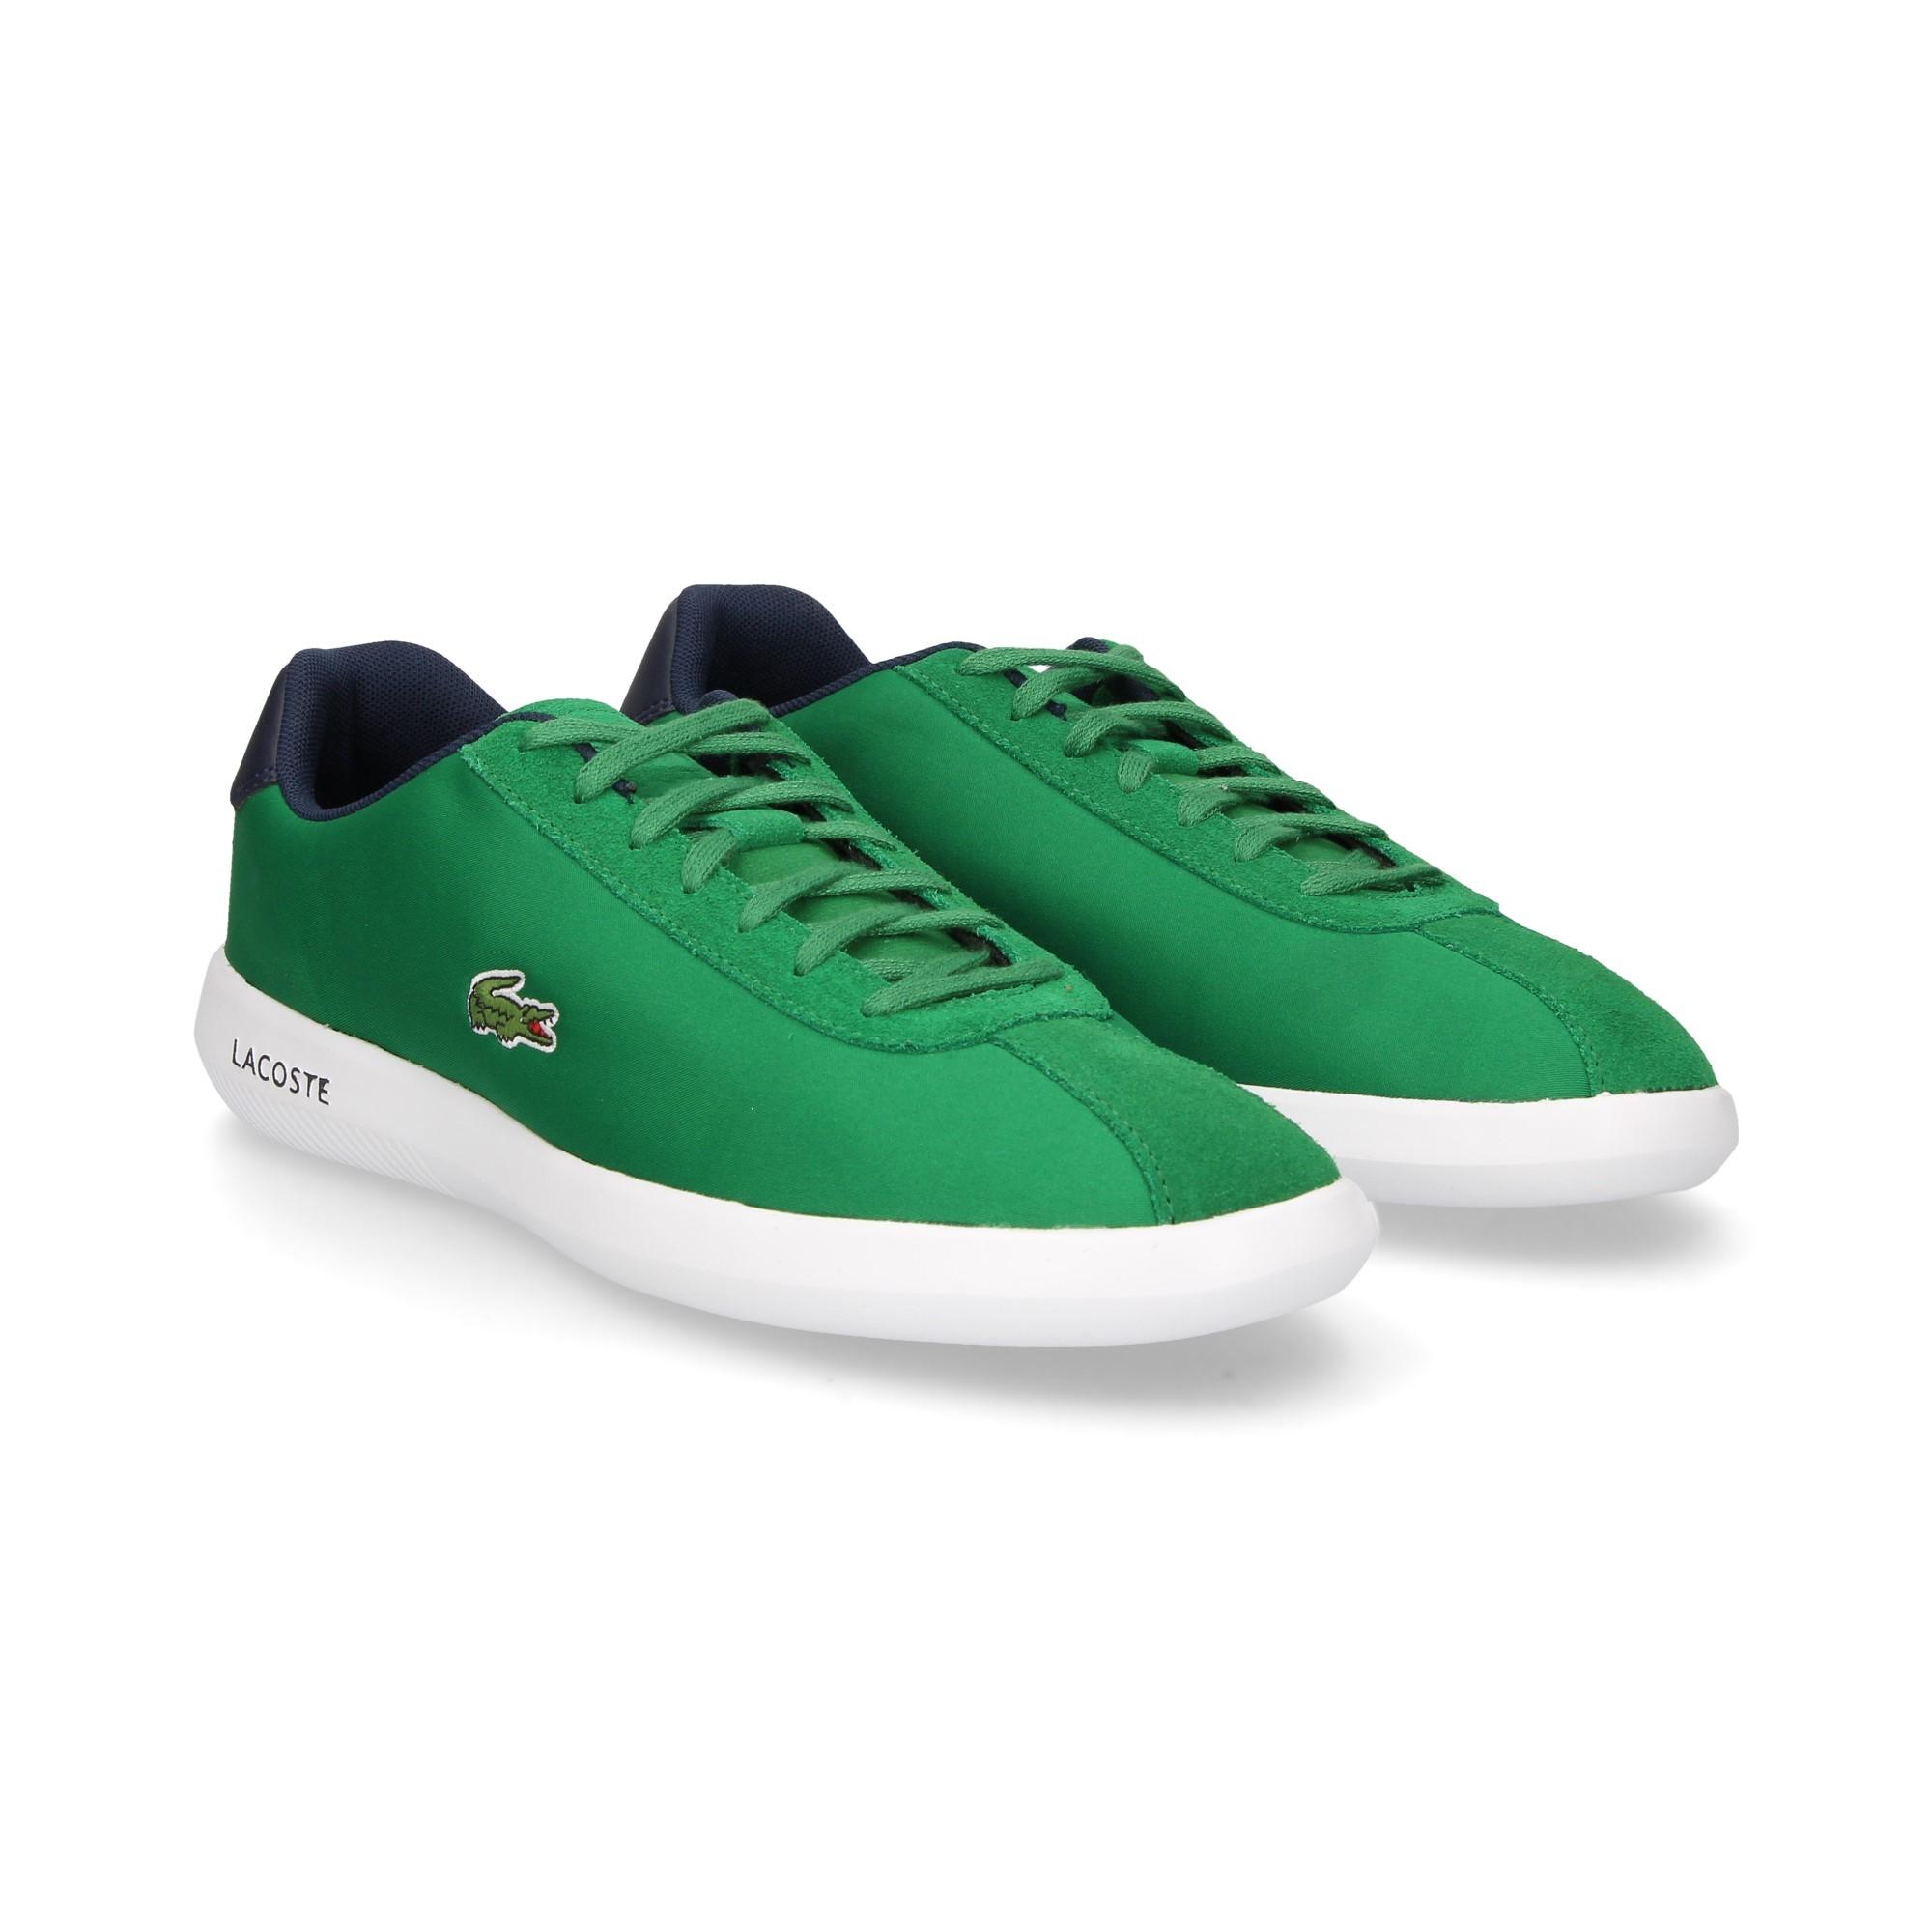 LACOSTE Men s sneakers 36SPM0006 GN1 VERDE 61a2655eed